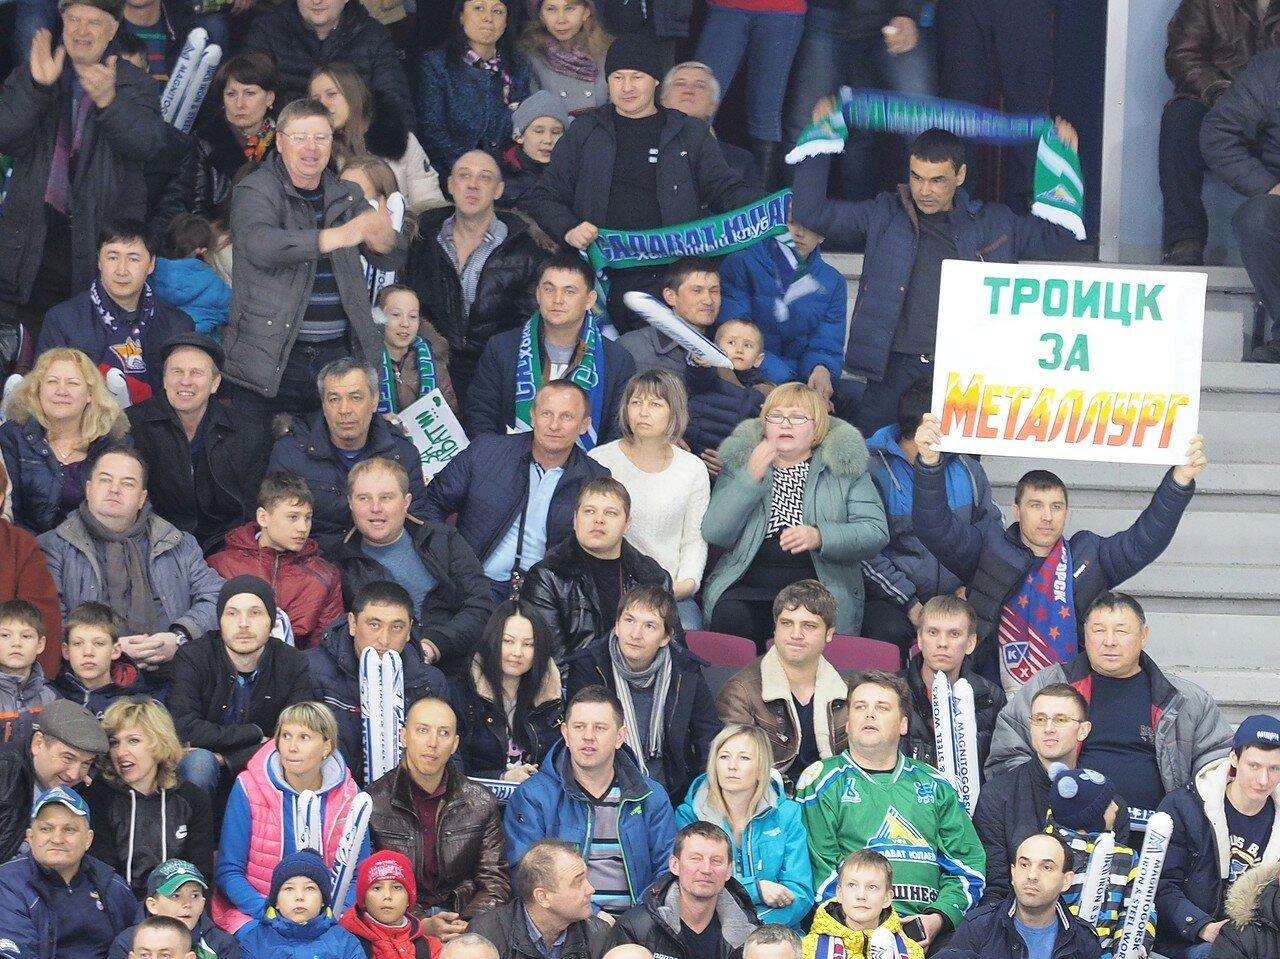 69Плей-офф 2016 Восток Финал Металлург - Салават Юлаев 25.03.2016